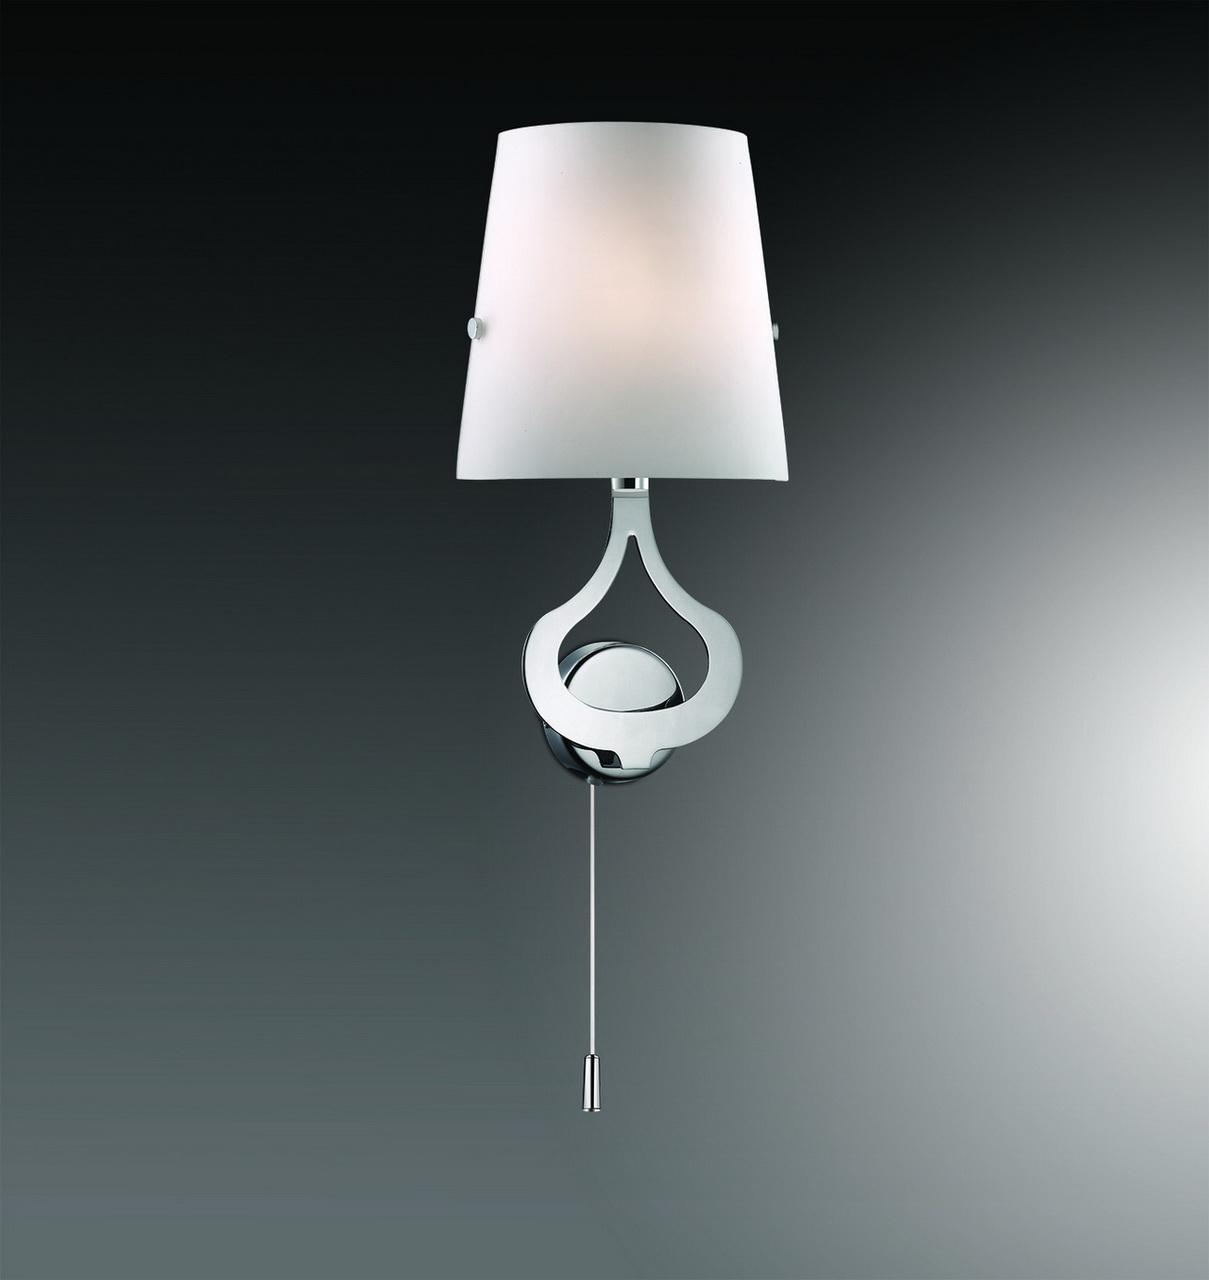 Бра Odeon Light Tiara 2184/1W odeon light накладной светильник tiara 2025 1w